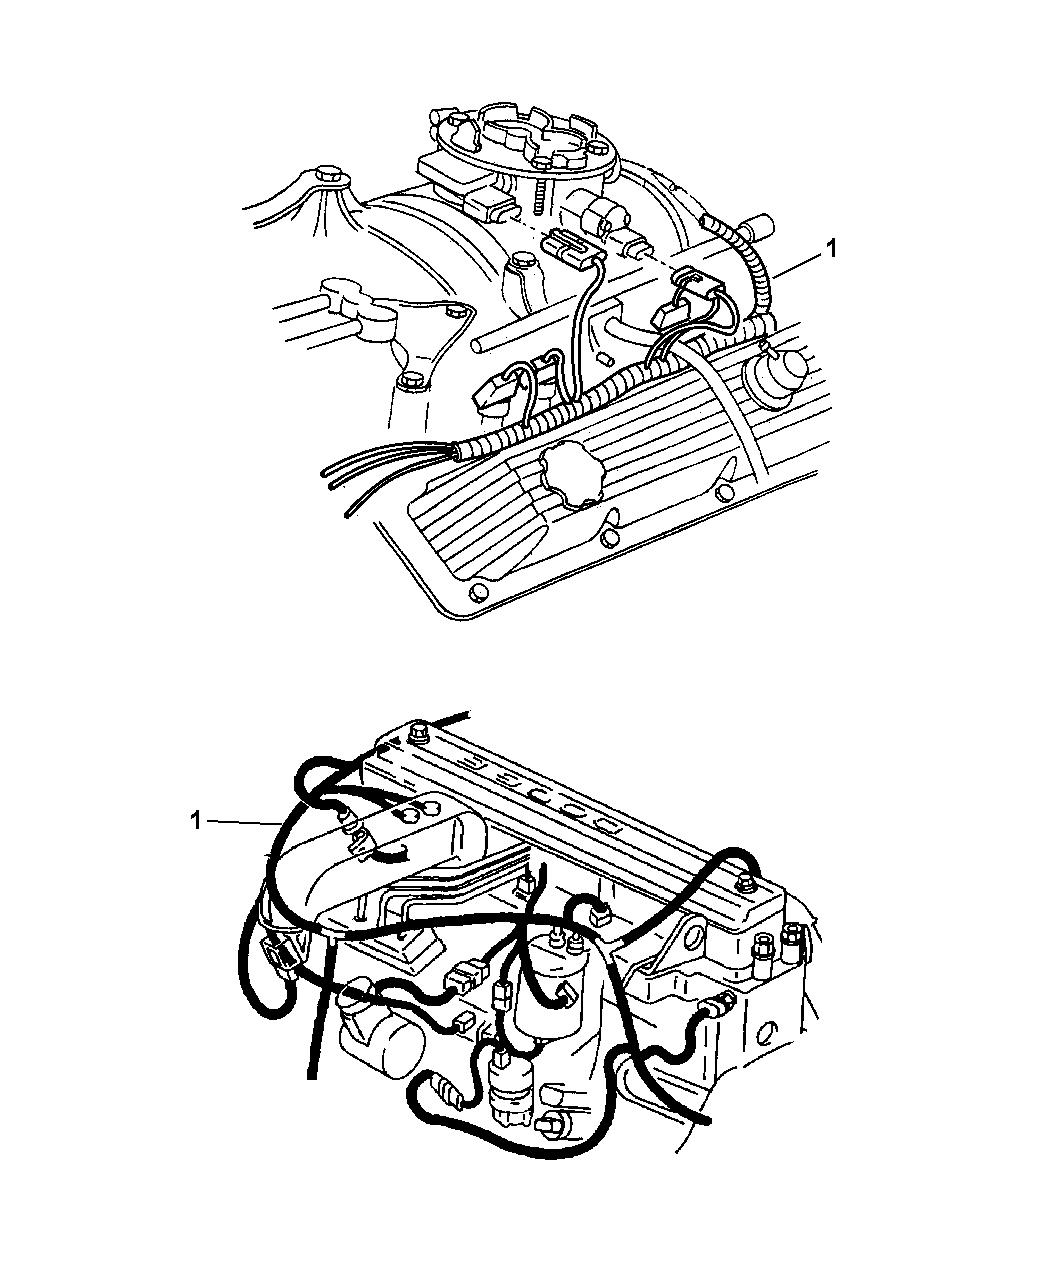 2001 Dodge Ram 3500 Regular Cab Wiring